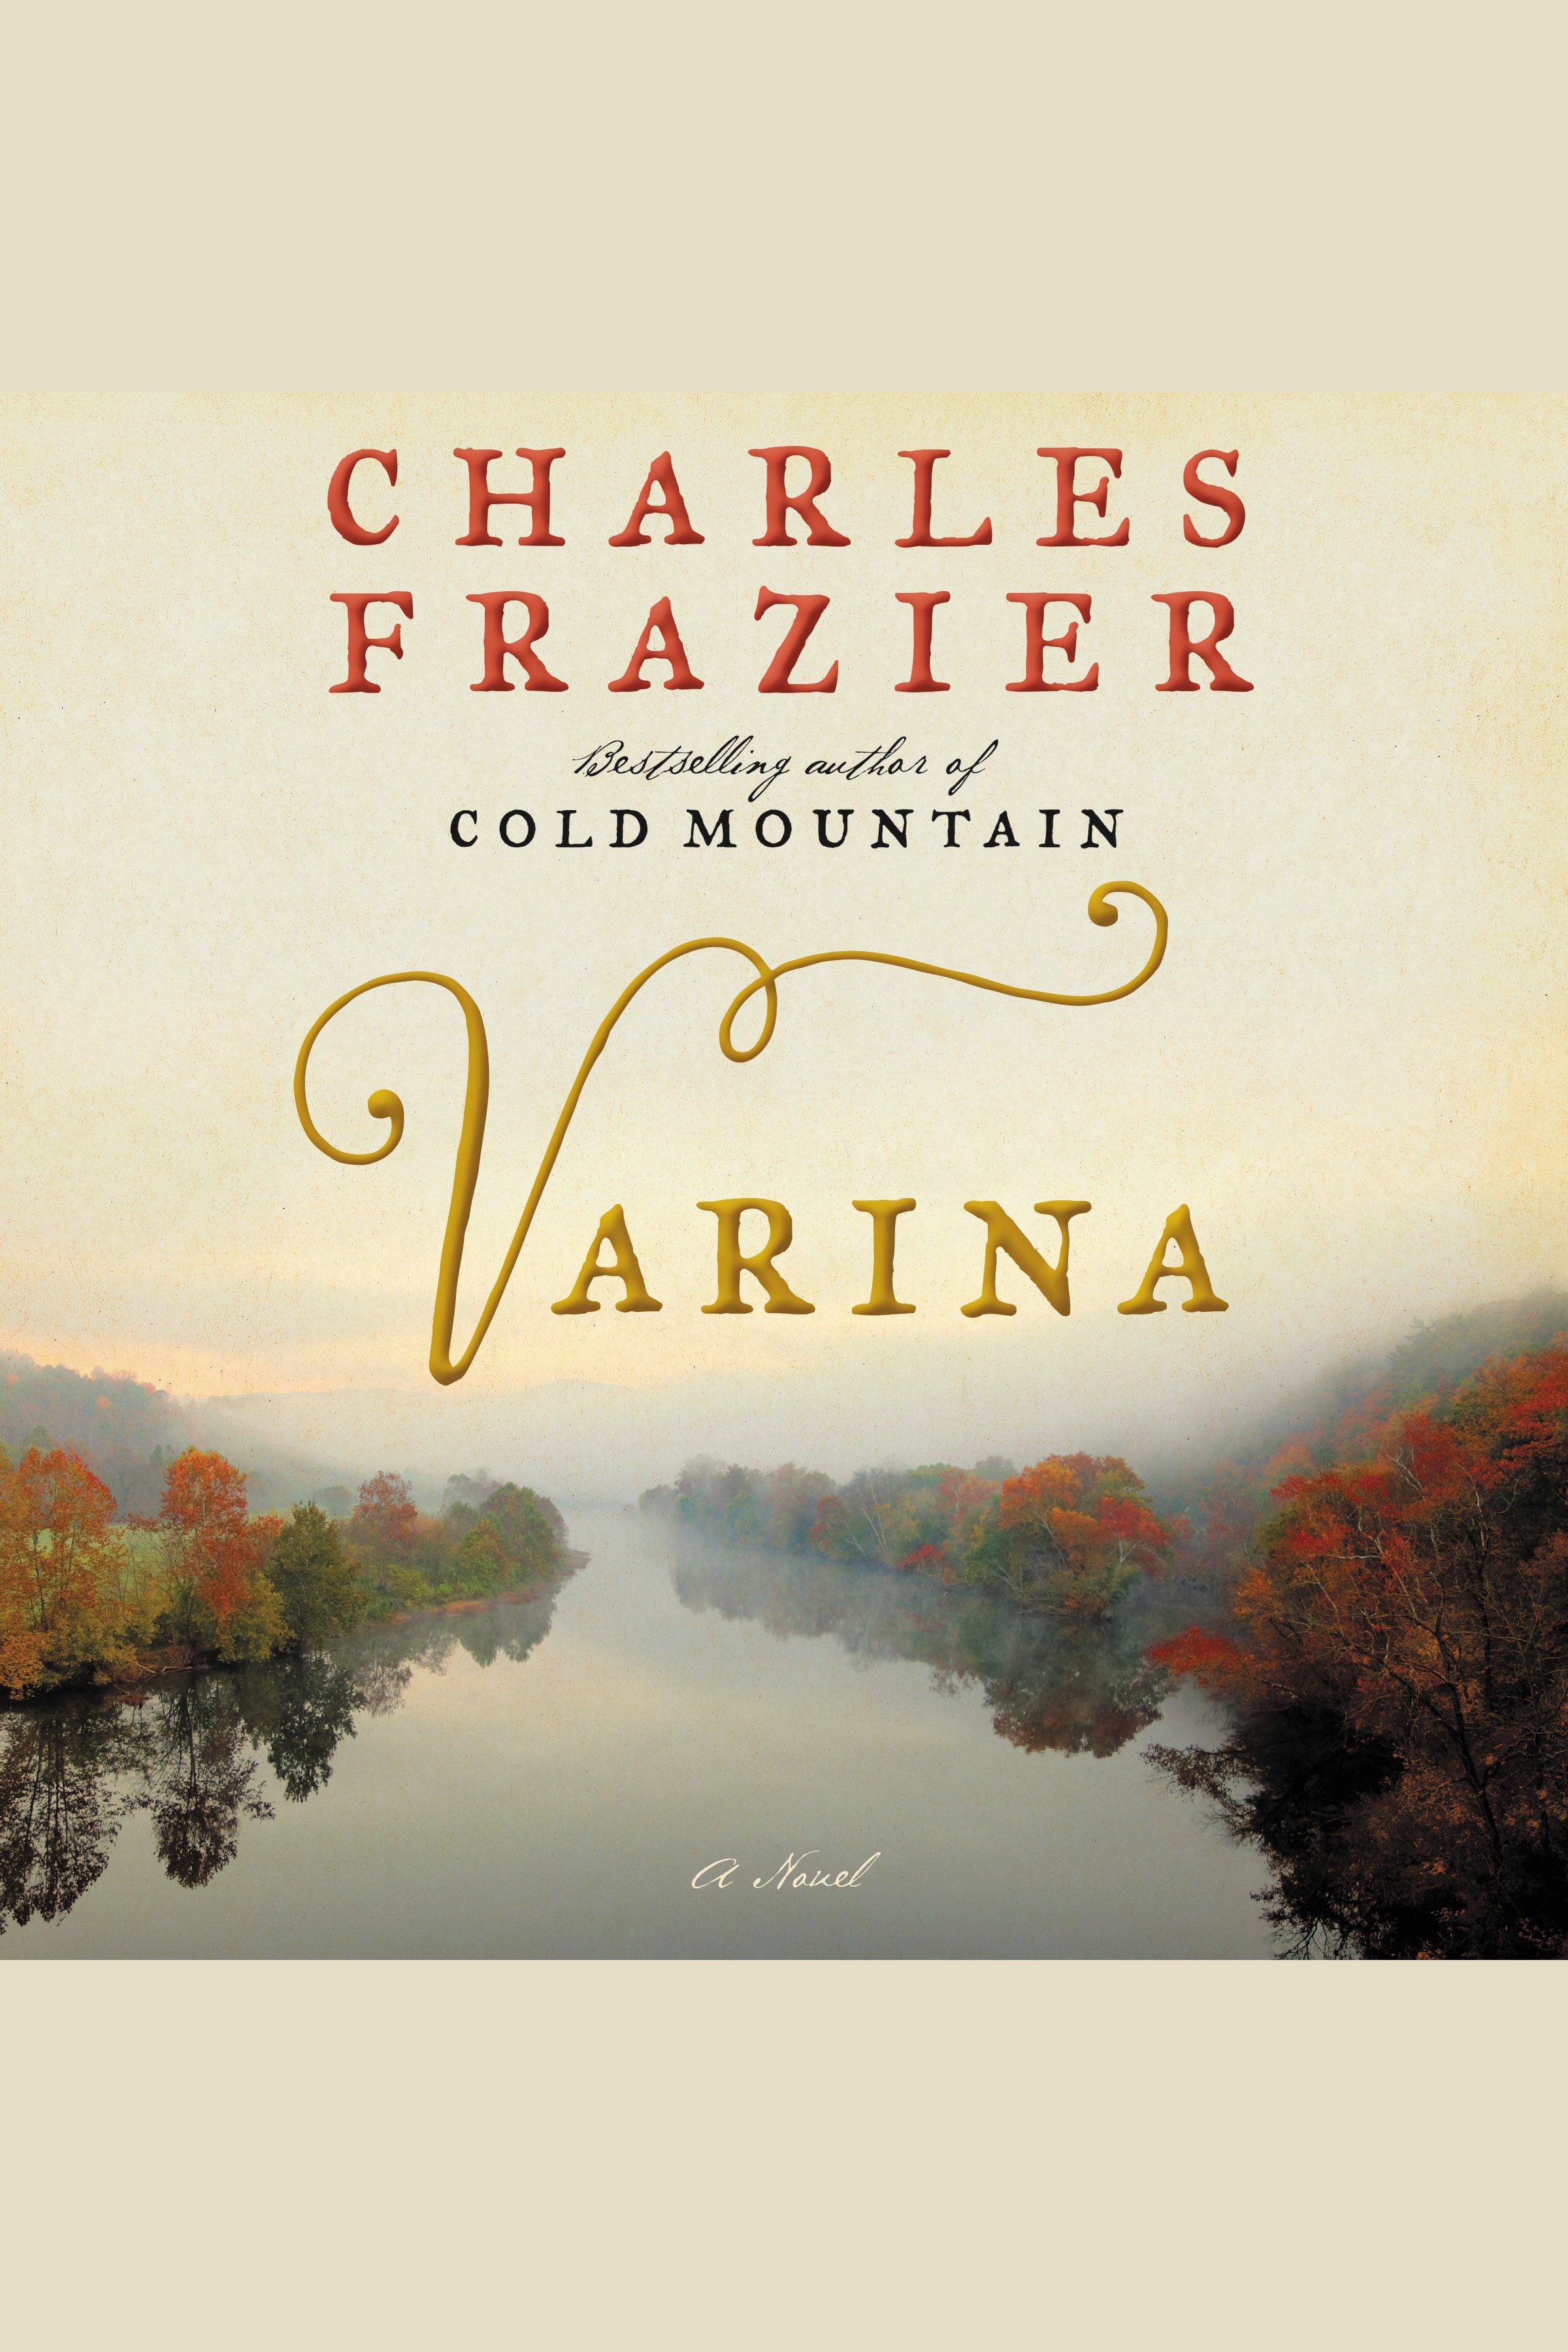 Varina [EAUDIOBOOK]: A Novel